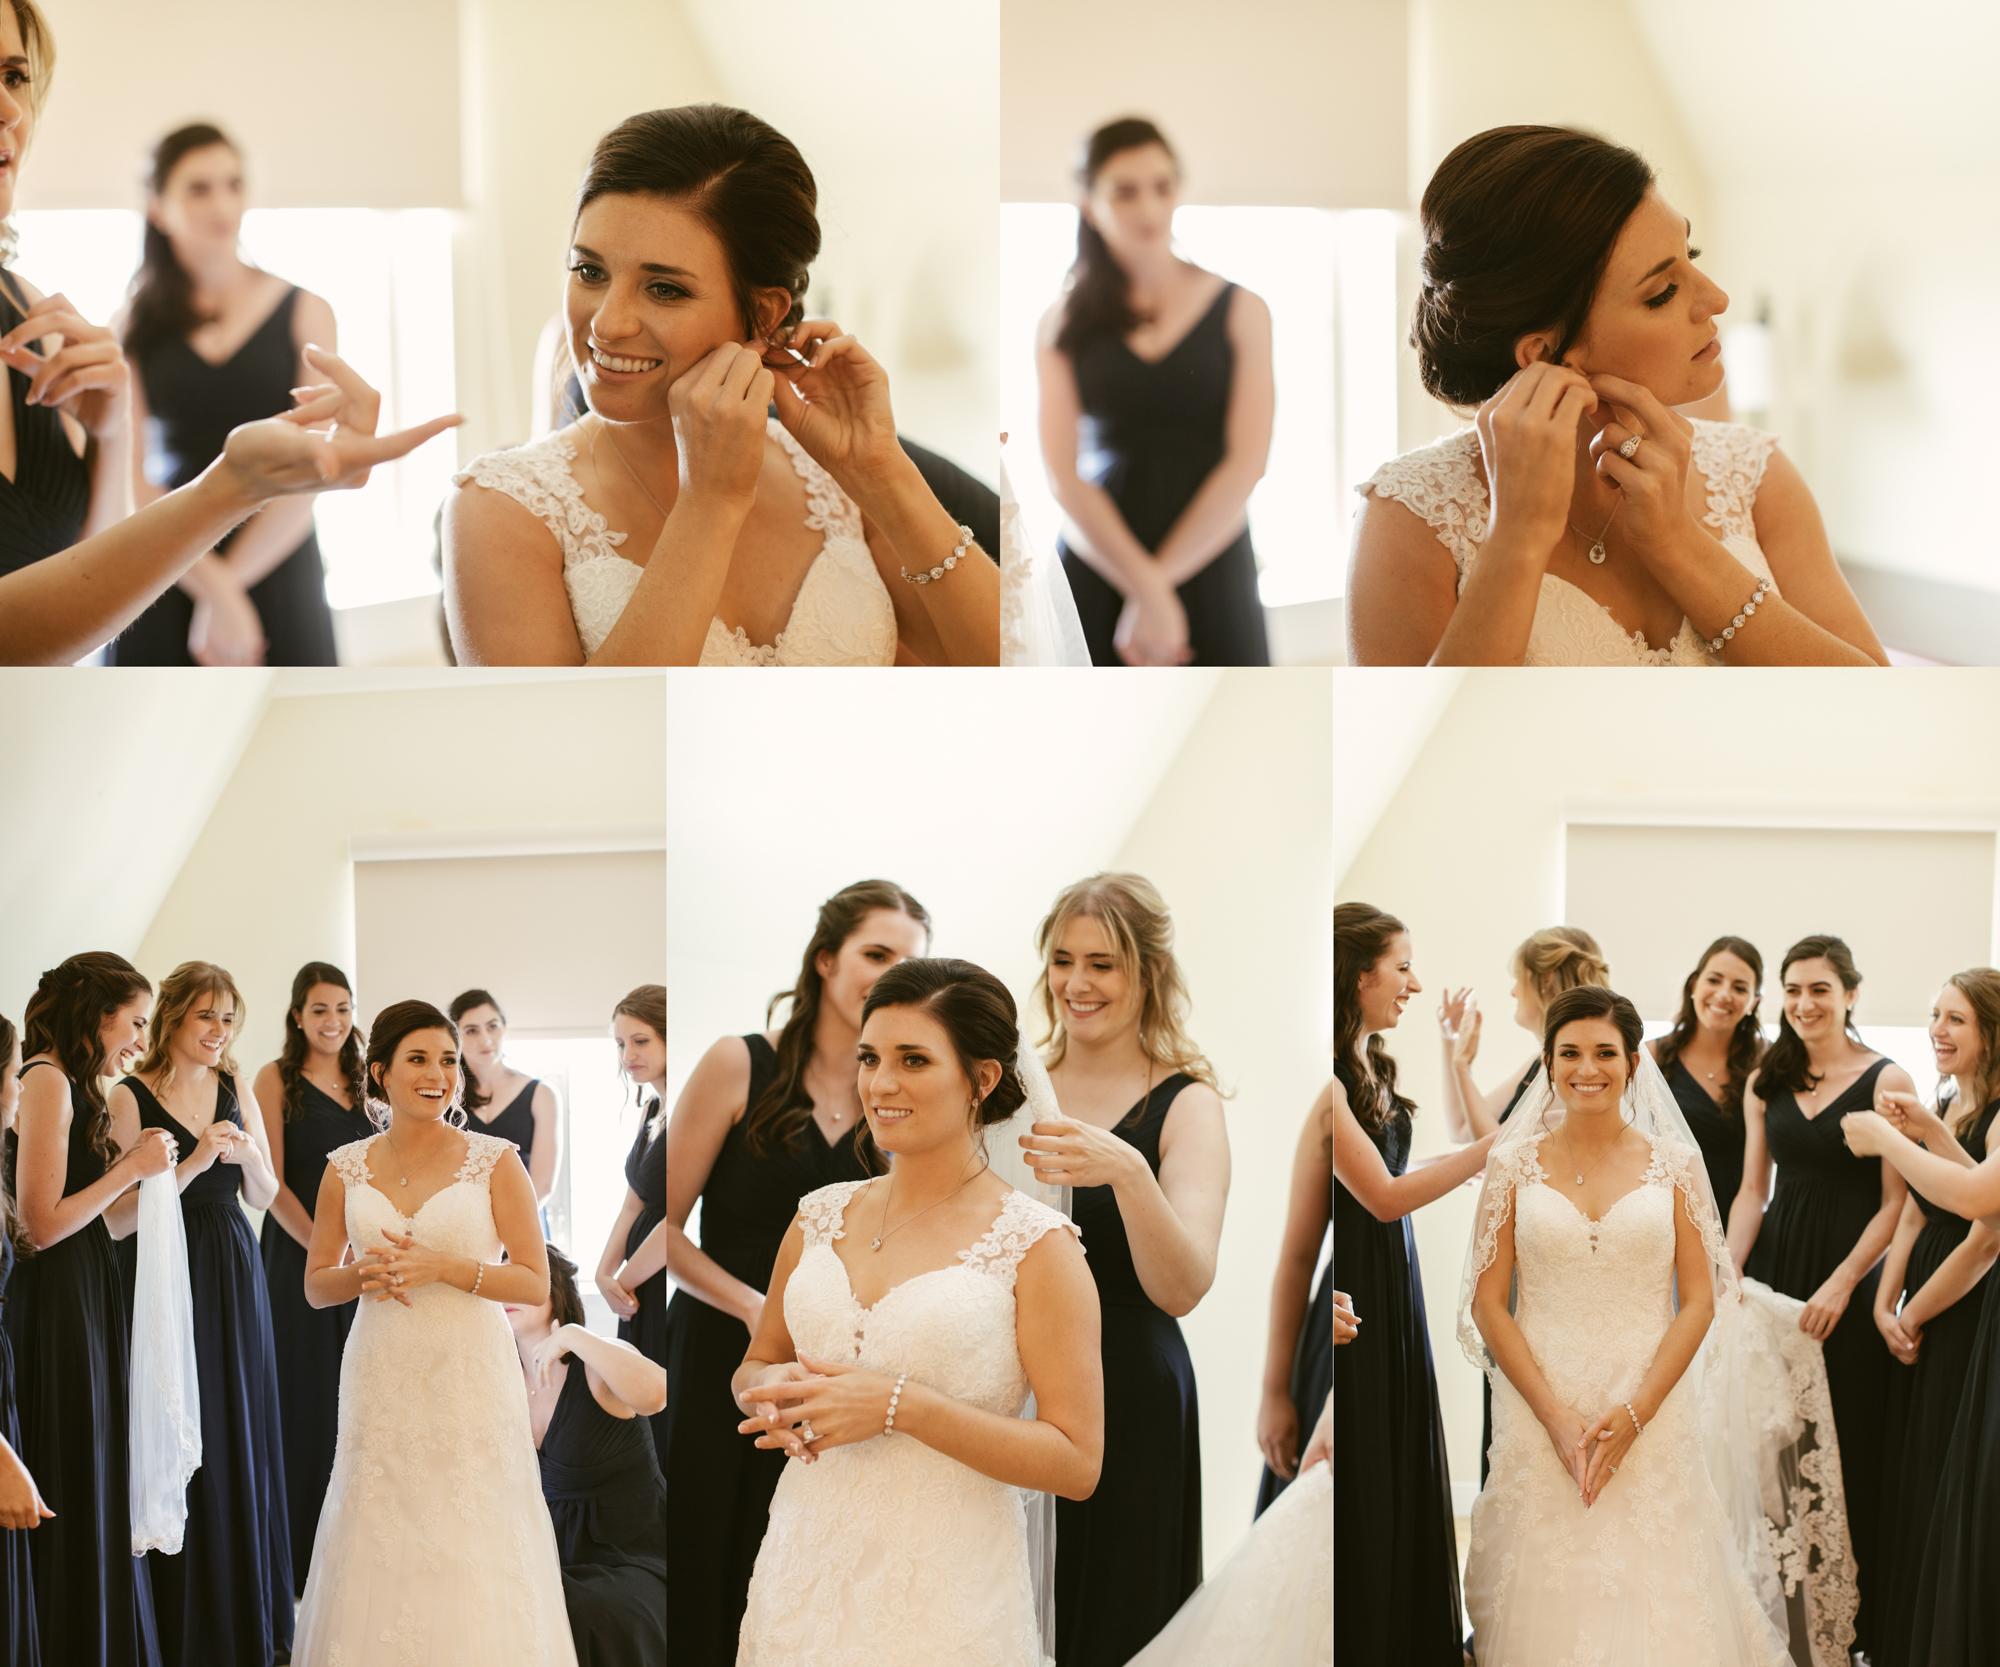 003 kaitlyn-colin-notre-dame-wedding.jpg